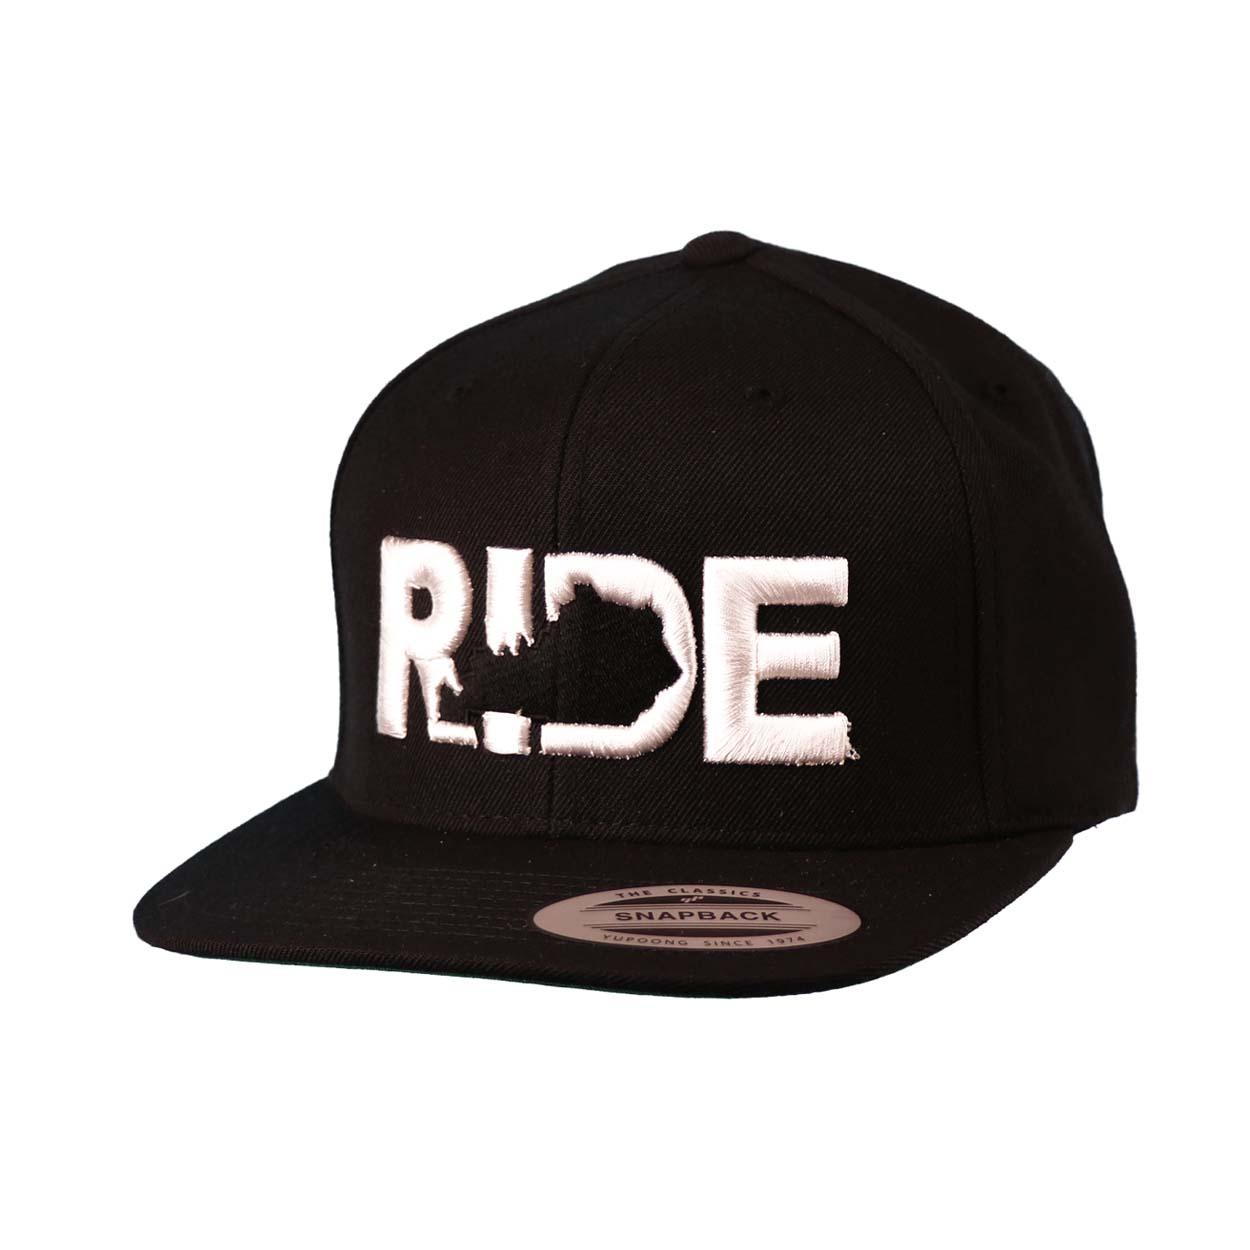 Ride Kentucky Classic Embroidered  Snapback Flat Brim Hat Black/White